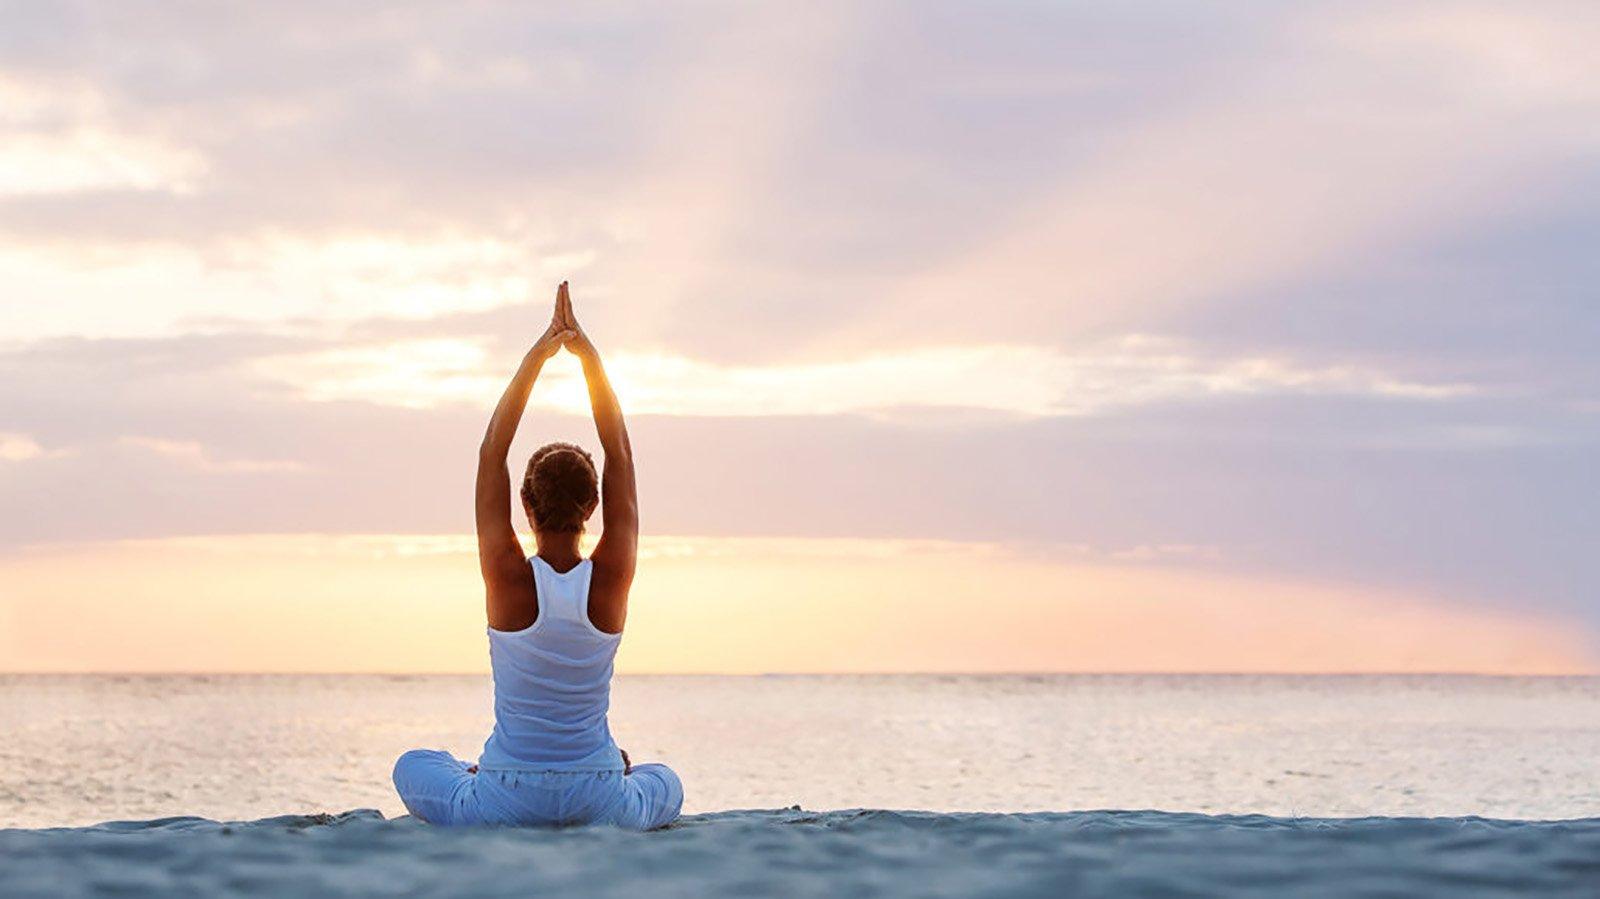 Maldives Beach Yoga Wellness